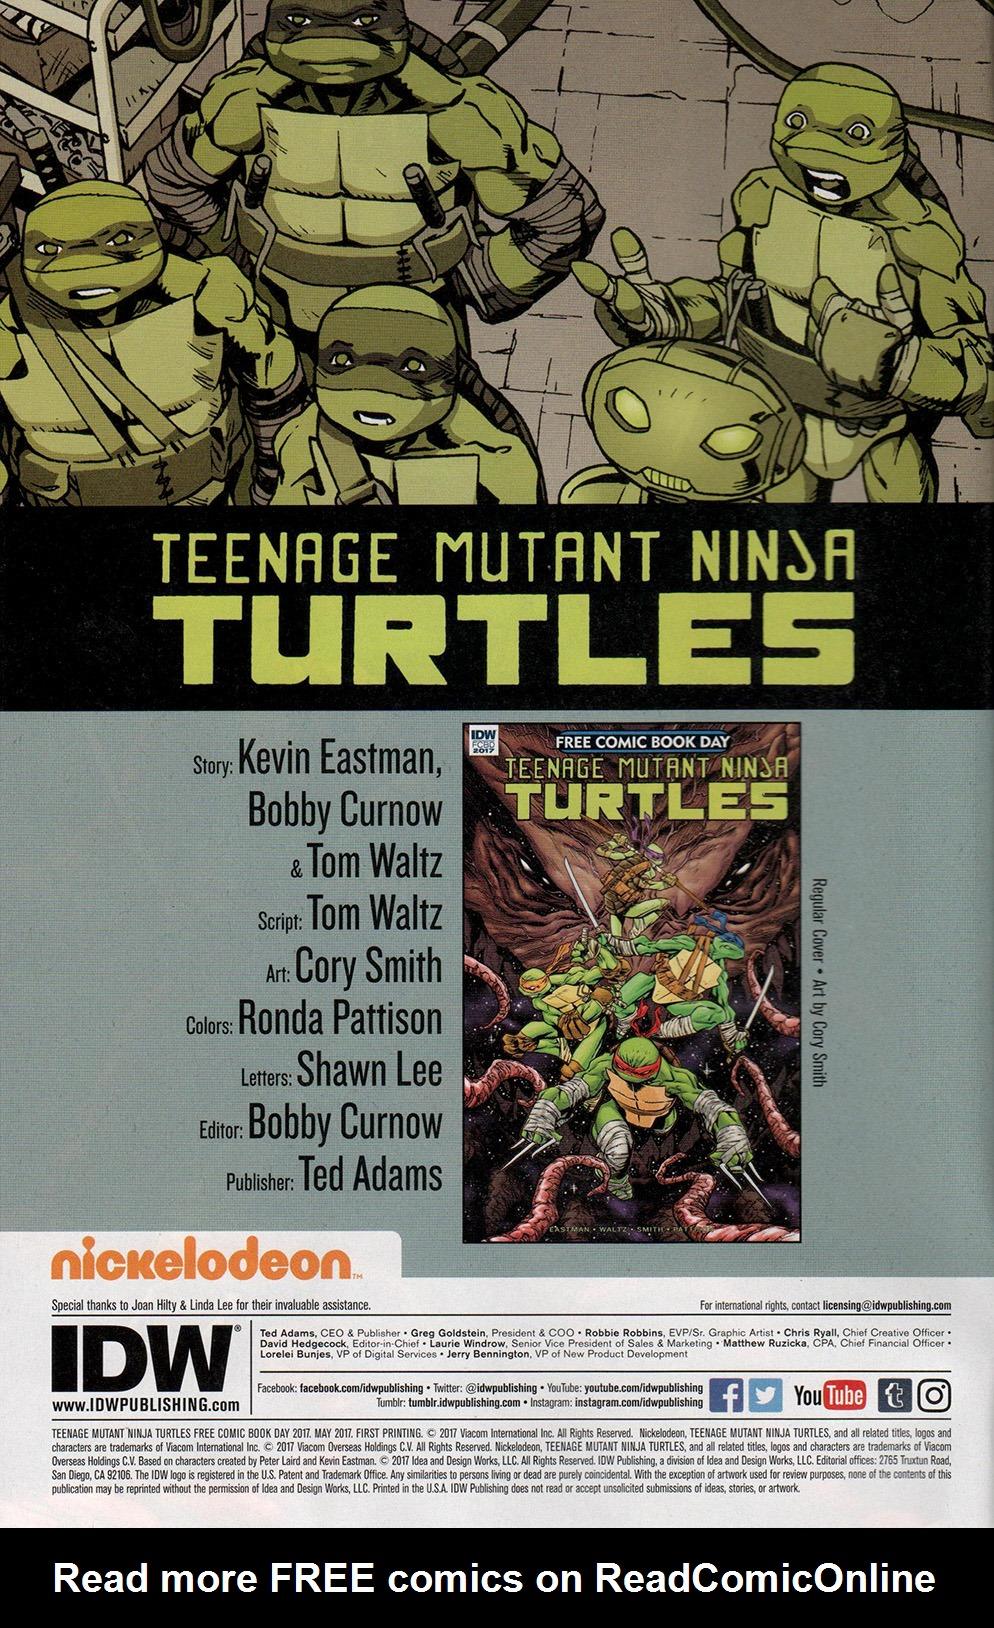 Read online Free Comic Book Day 2017 comic -  Issue # Teenage Mutant Ninja Turtles - 2